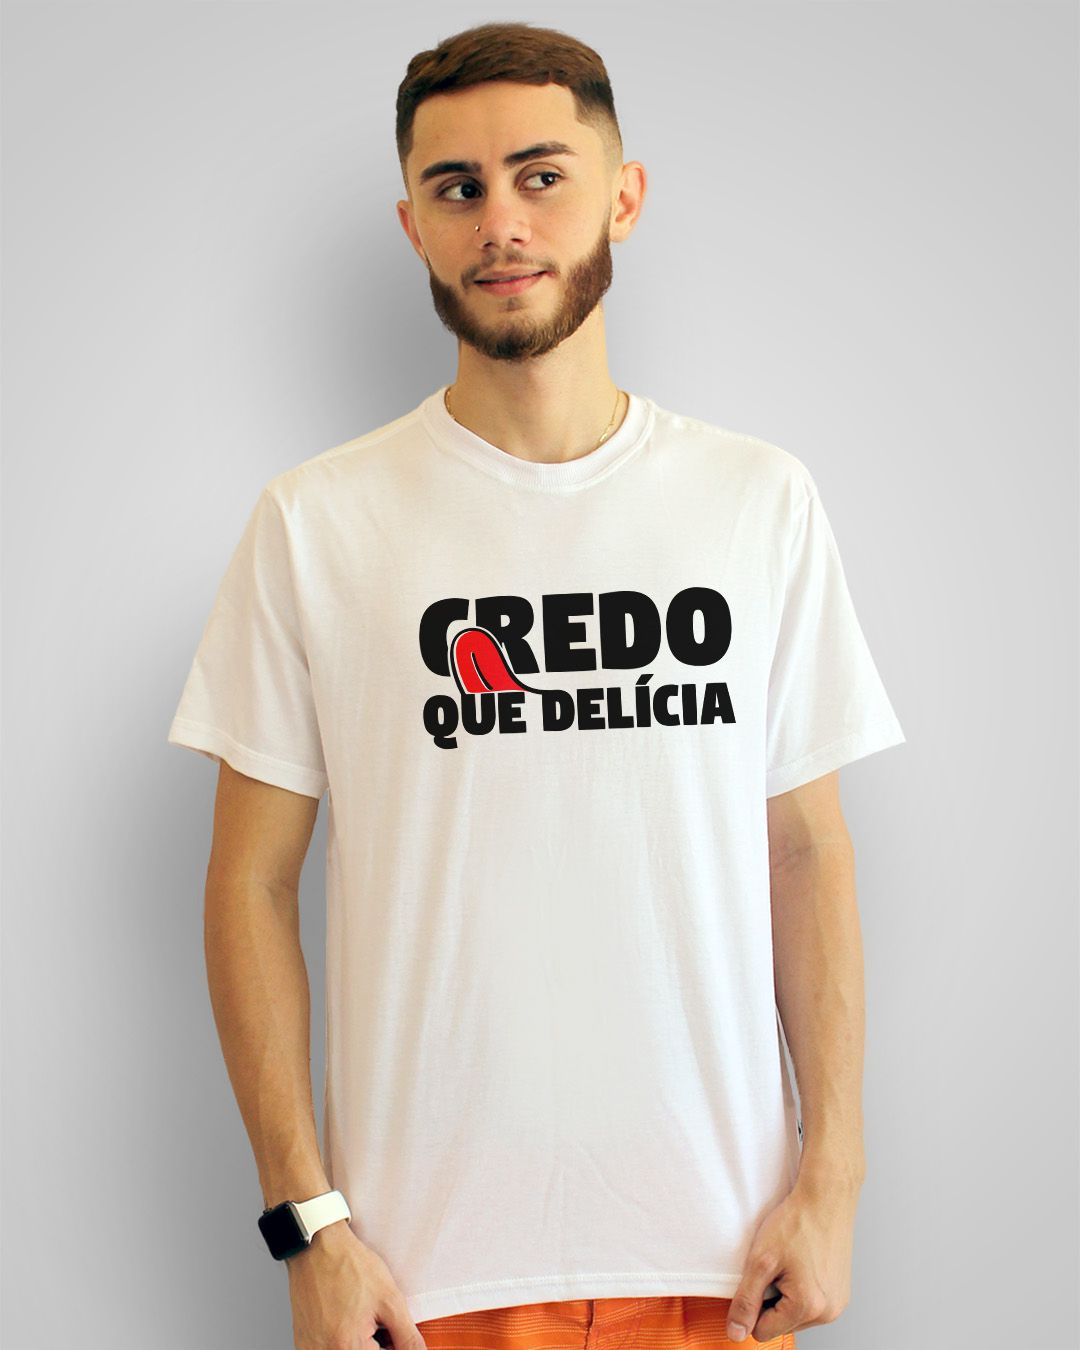 Camiseta Credo, que delícia